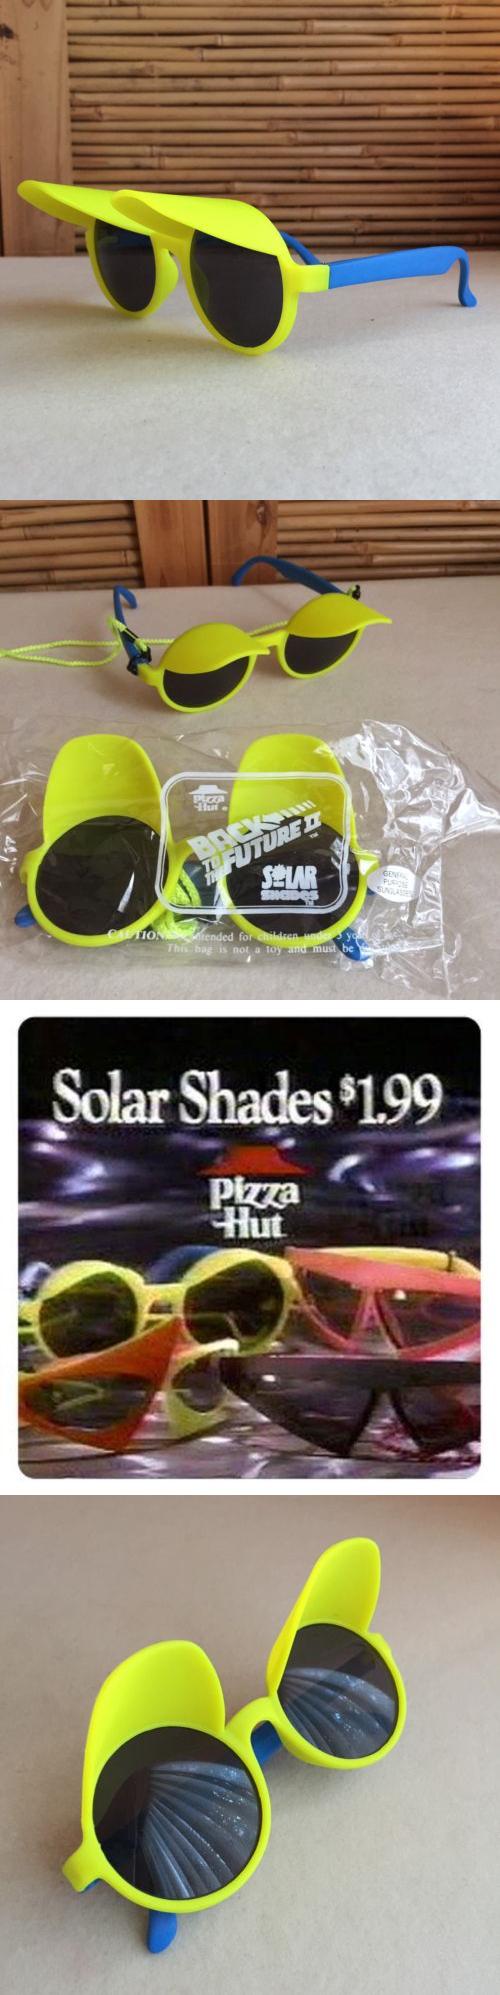 ddfe23de89 Sunglasses 48559  Retro Vintage 1989 Back To The Future Ii Pizza Hut Sci-Fi  Promo Sunglasses -  BUY IT NOW ONLY   45 on eBay!